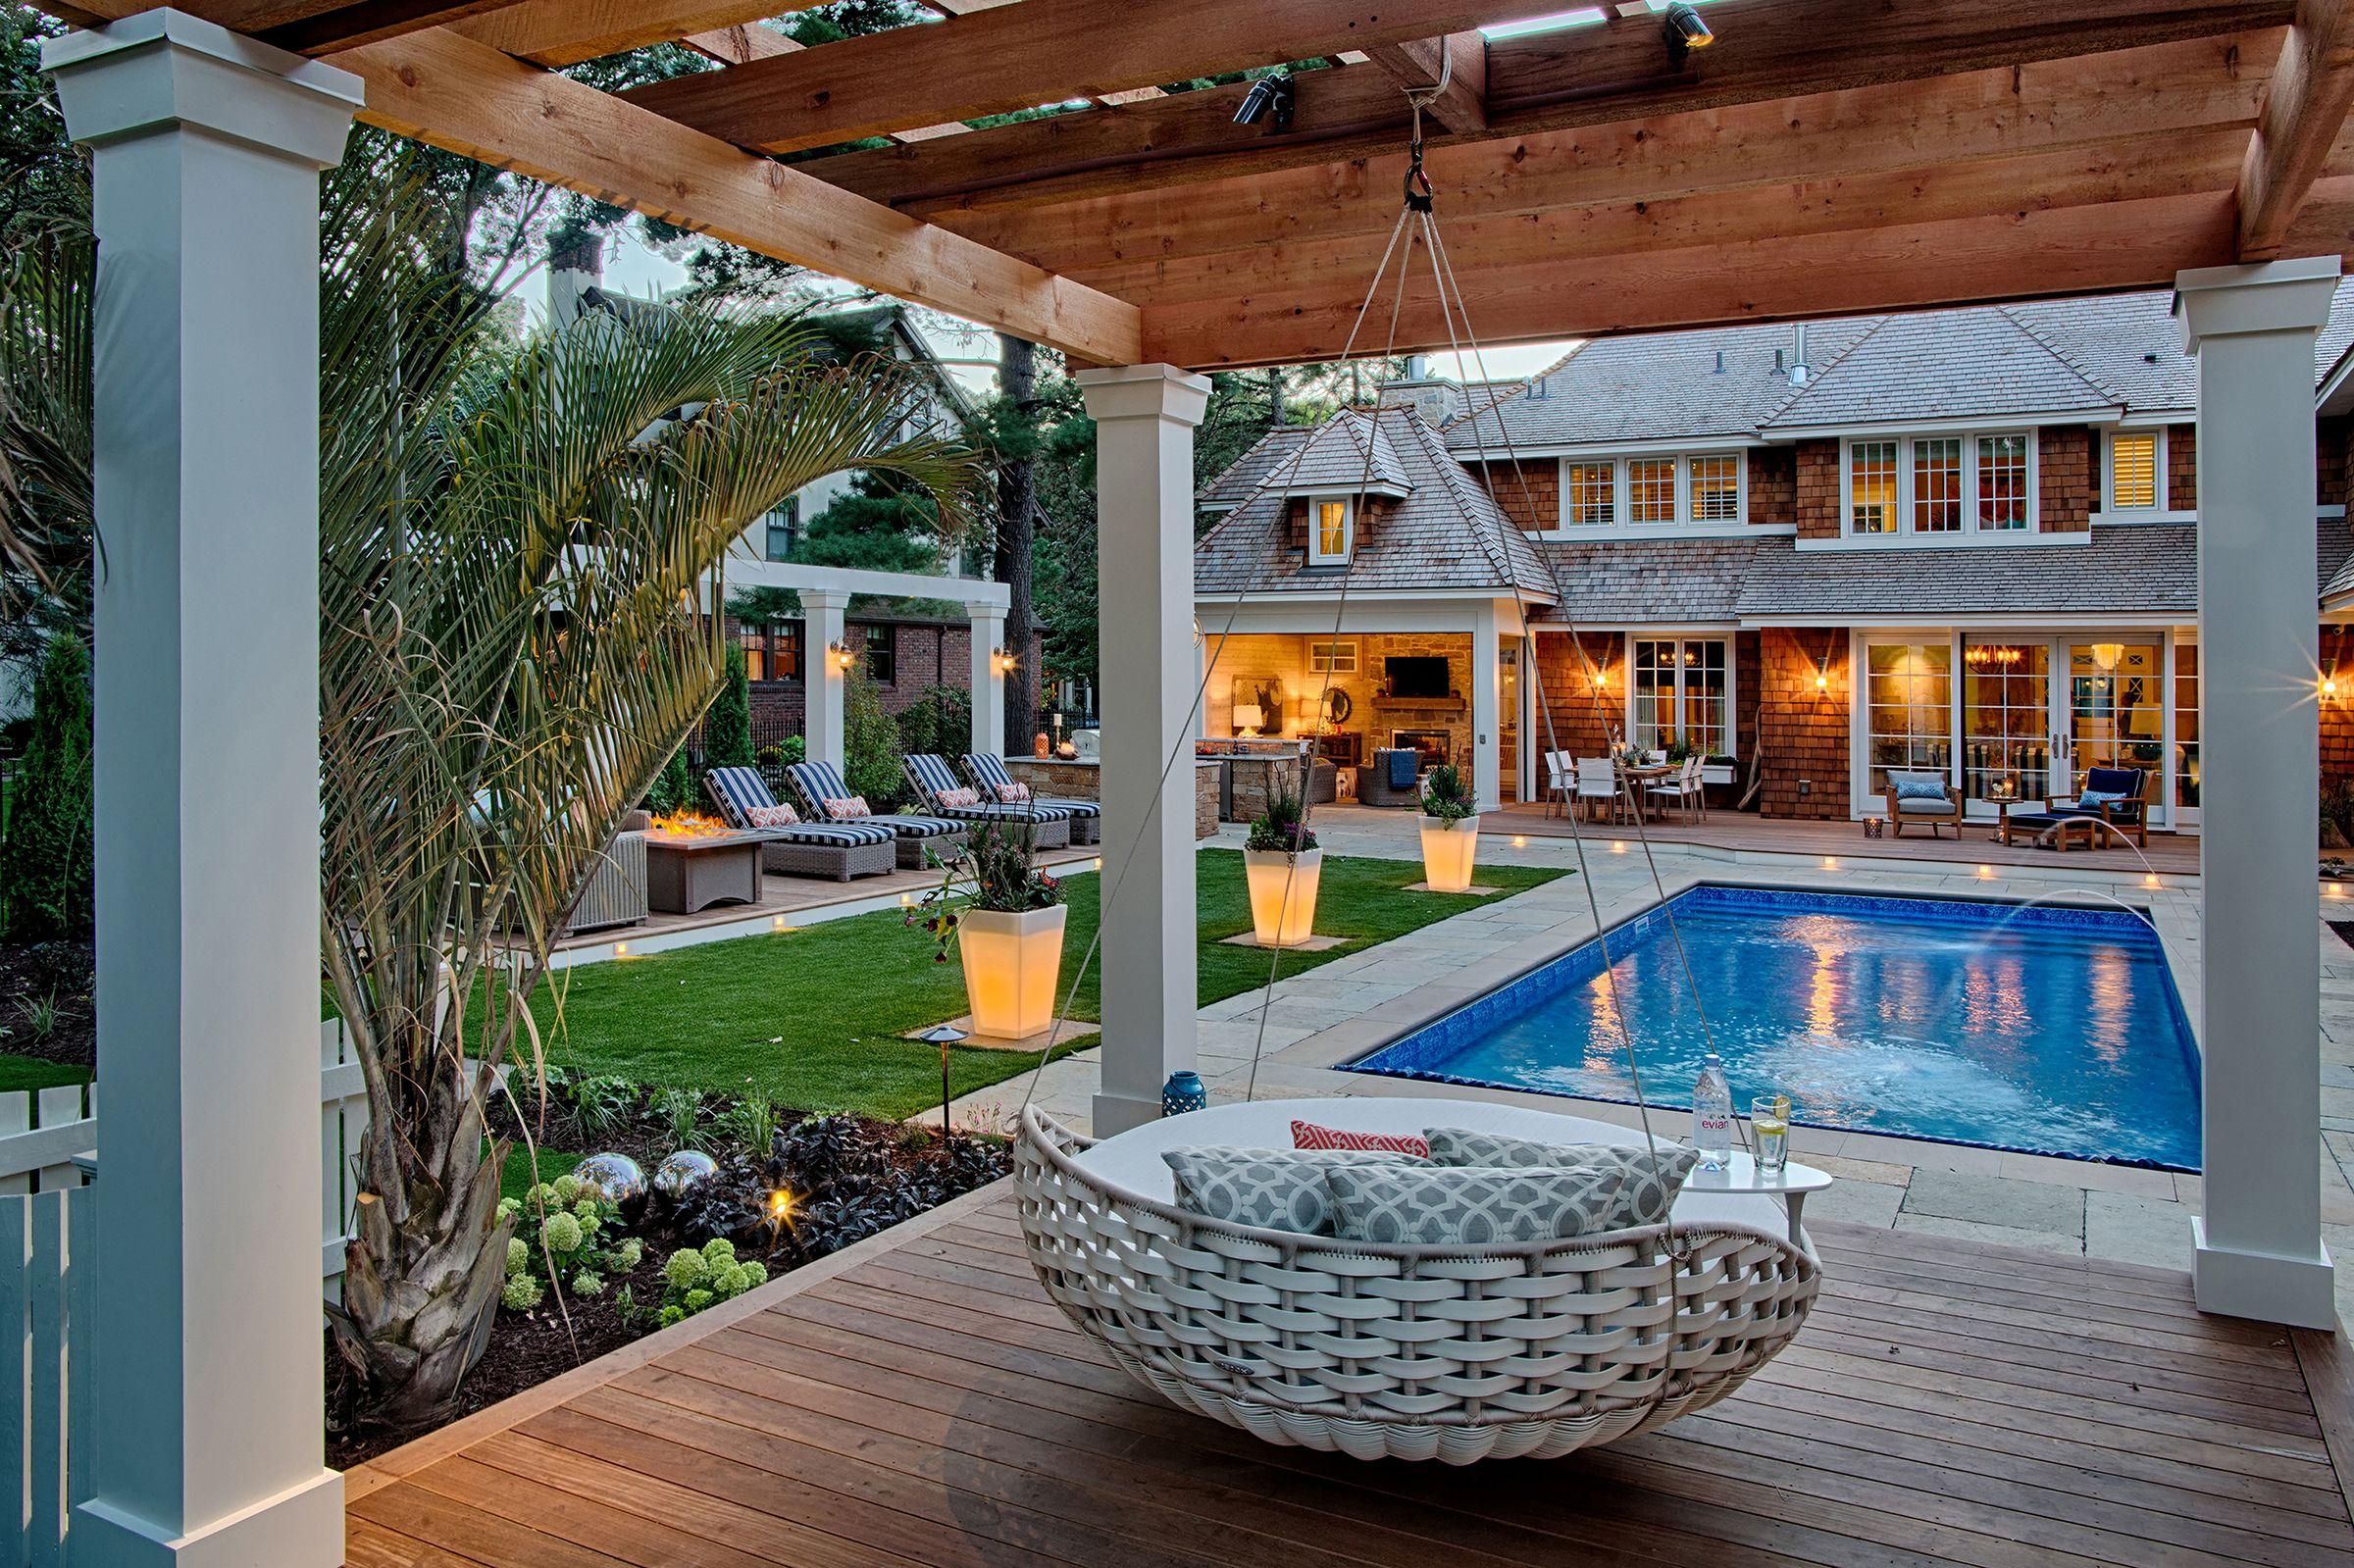 moroccan garden ideas - Google Search | Parnell patio landscape ...